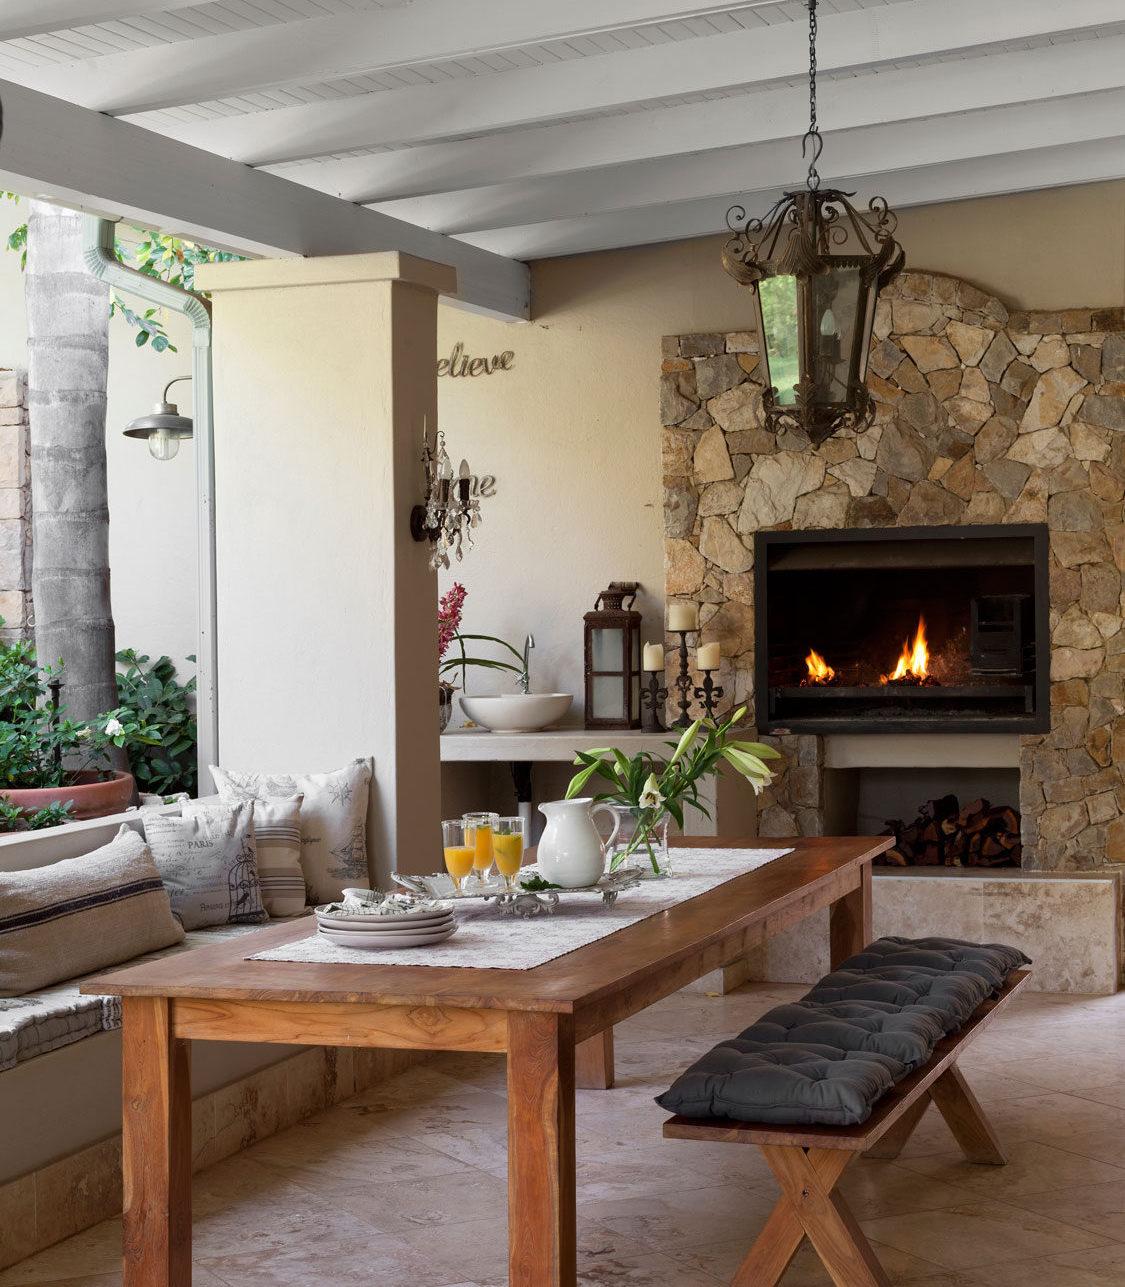 Outdoor Home Decor: Easy Home Decorating Ideas